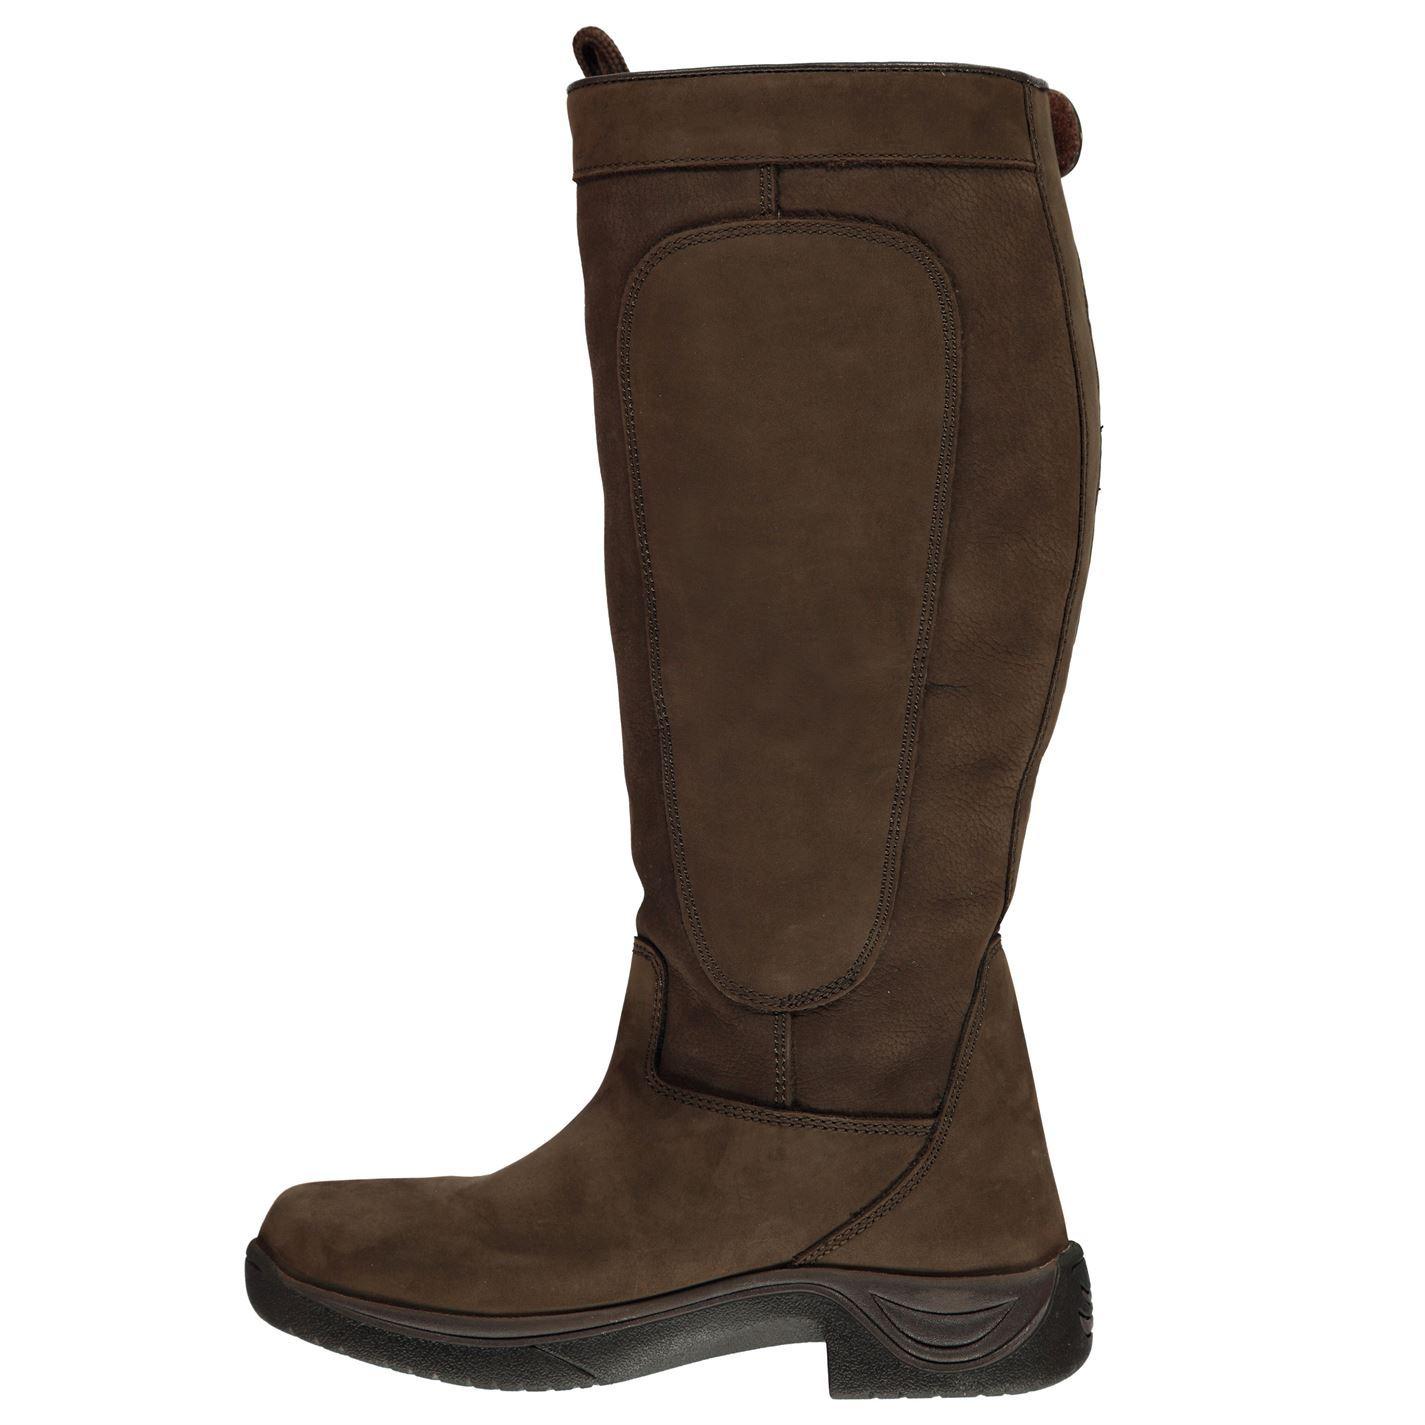 Dublin Pinnacle Boots II Chocolate Ladies 6